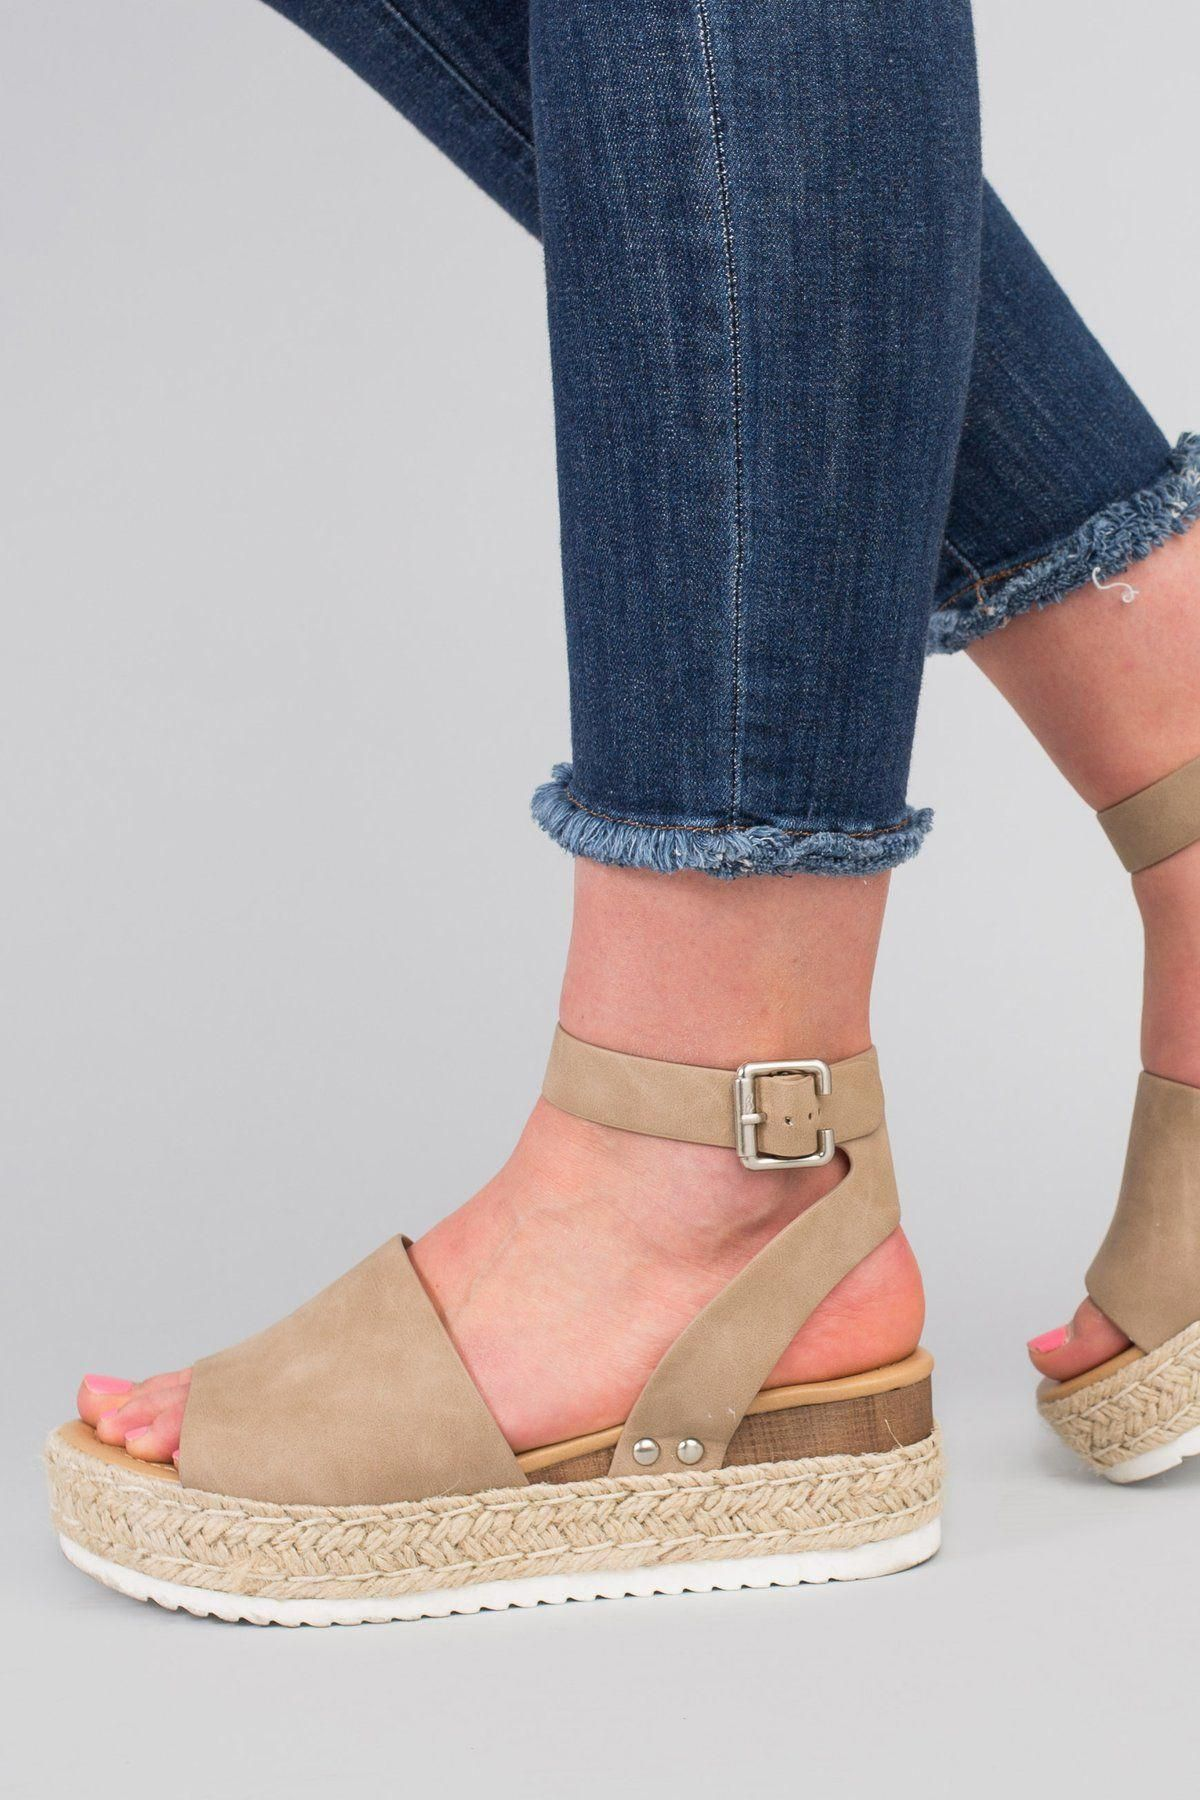 Platform sandals, Wedge sandals, Shoes